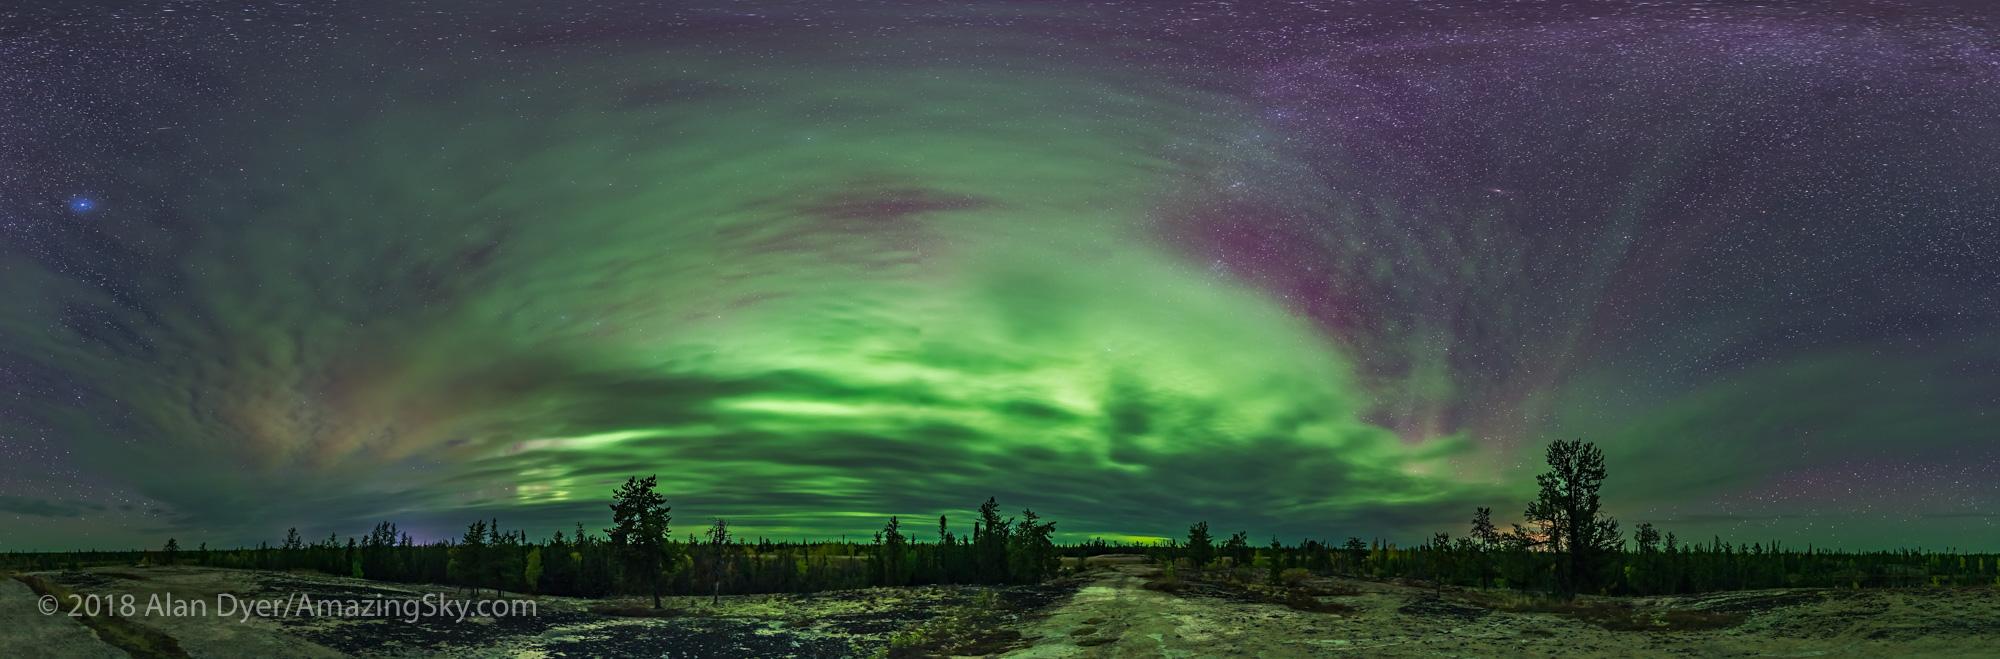 Aurora in the Clouds Panorama